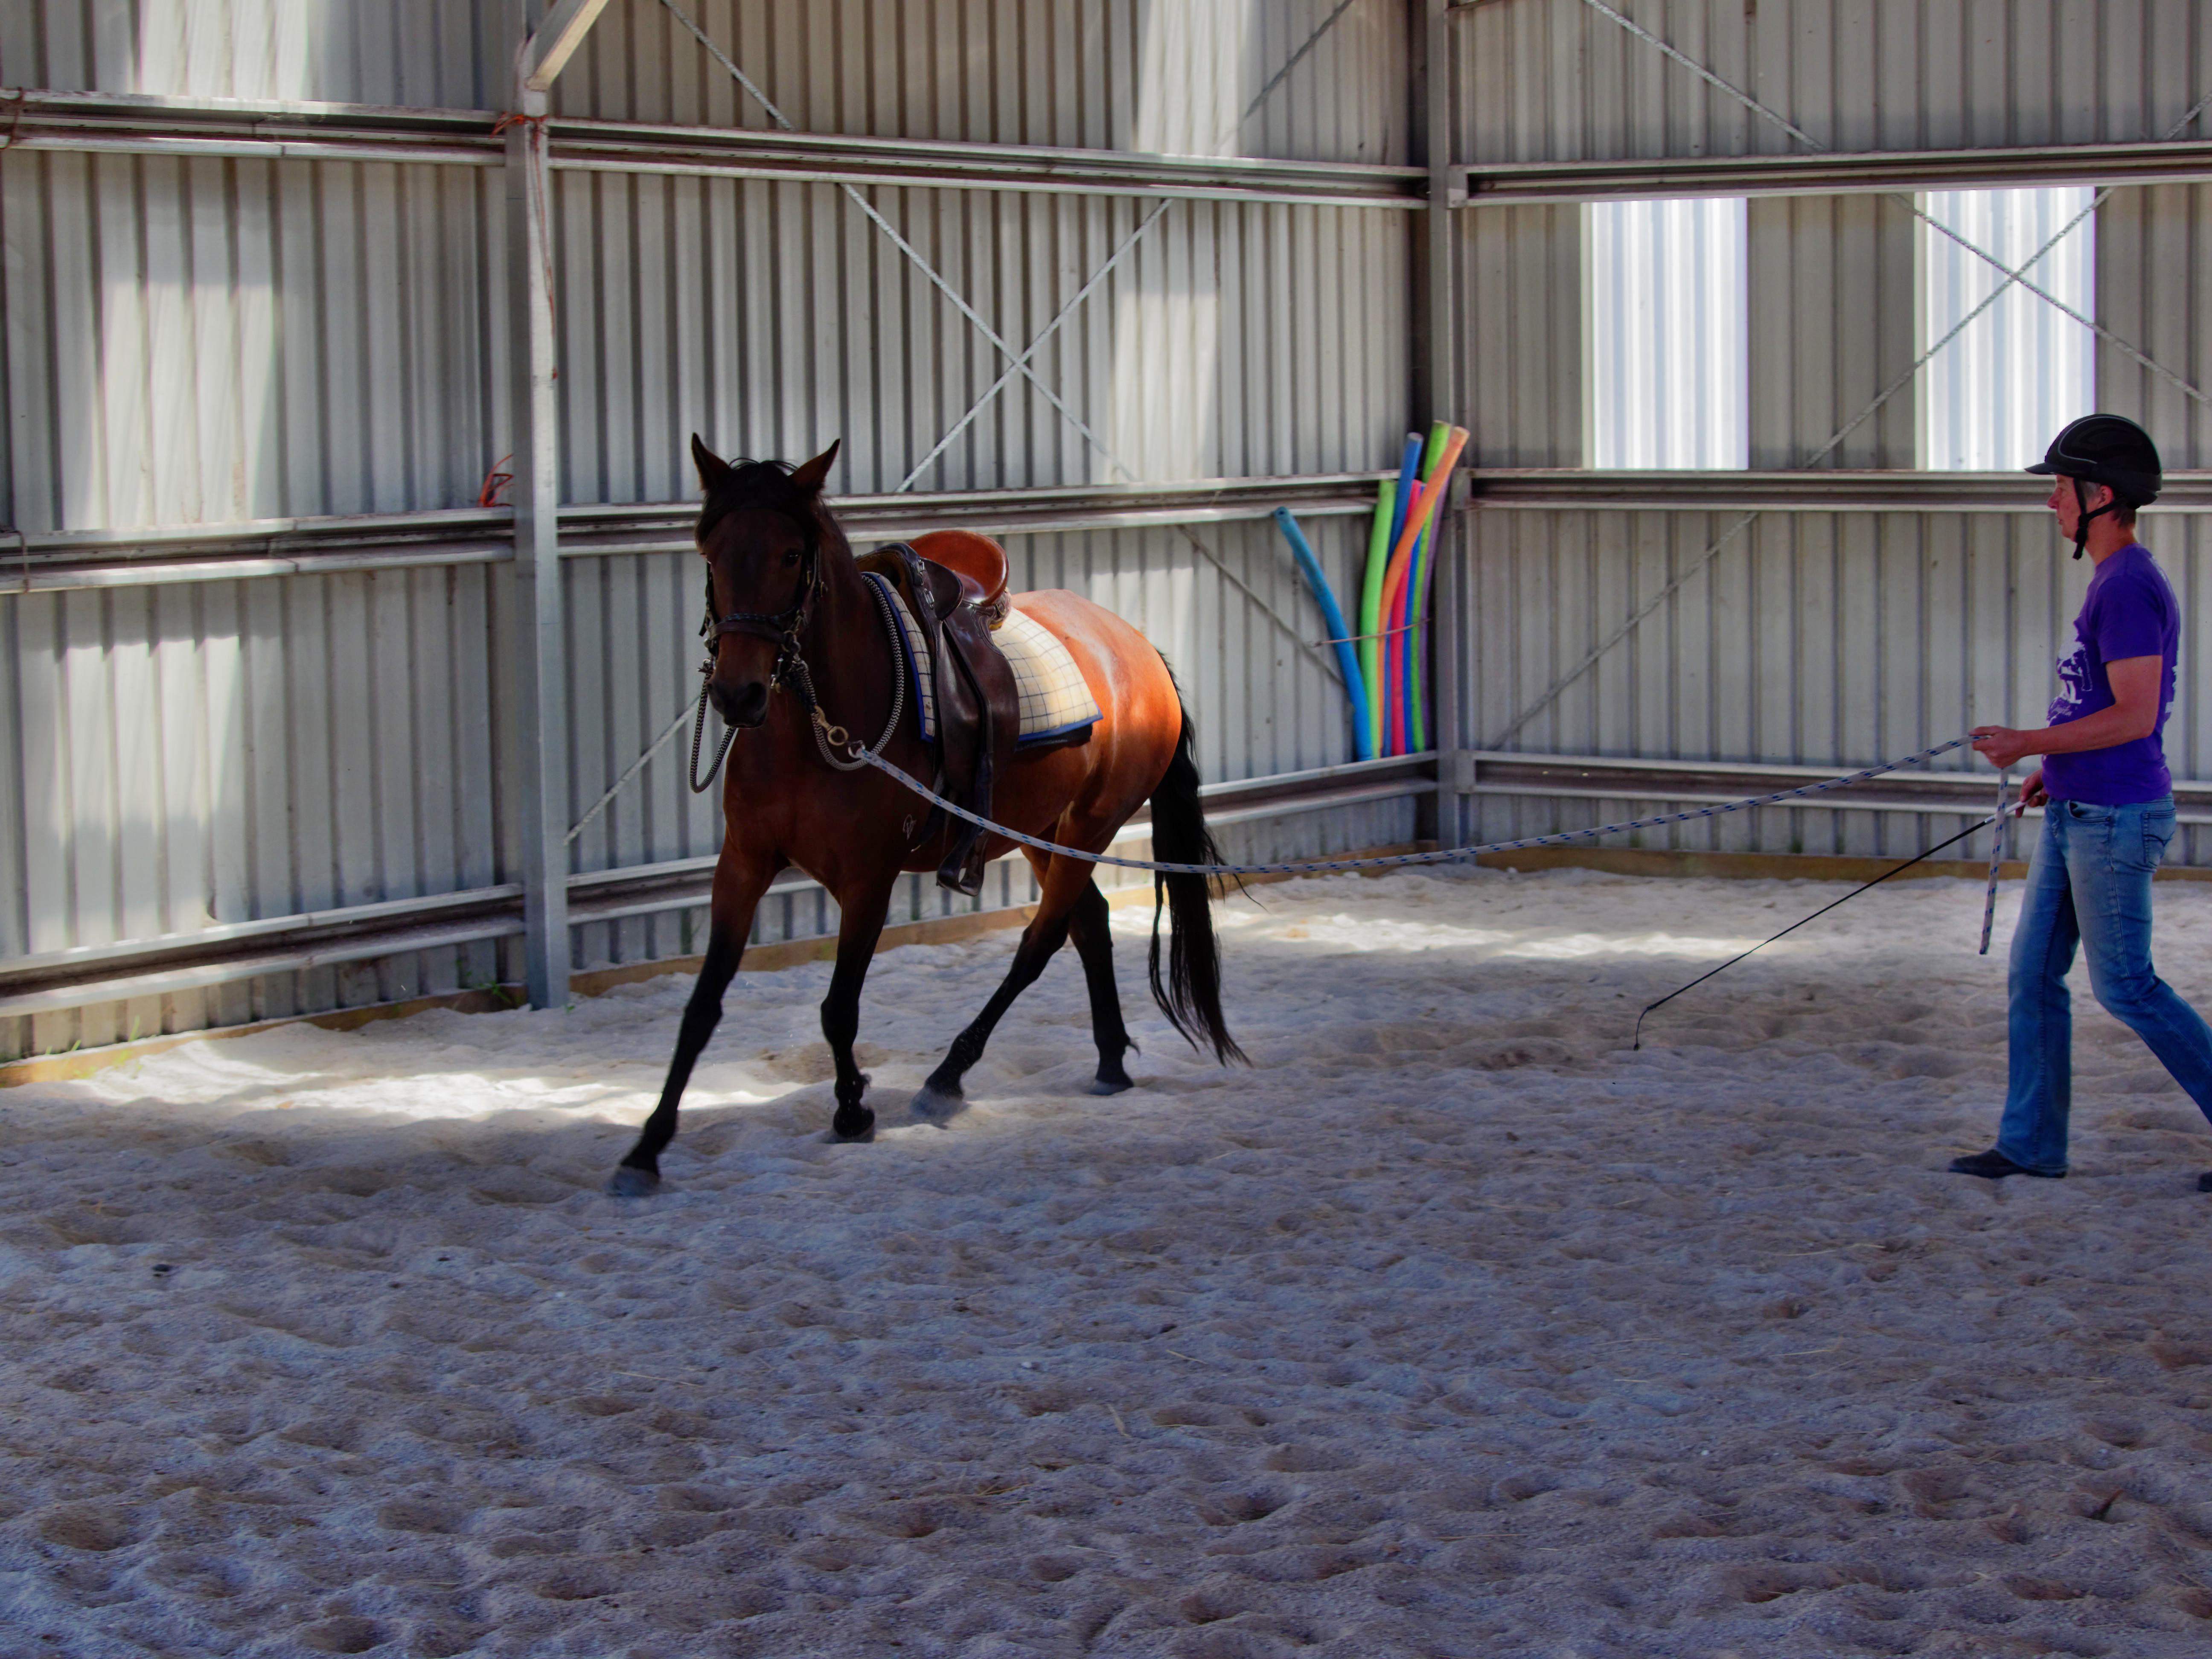 Horses-31.jpeg